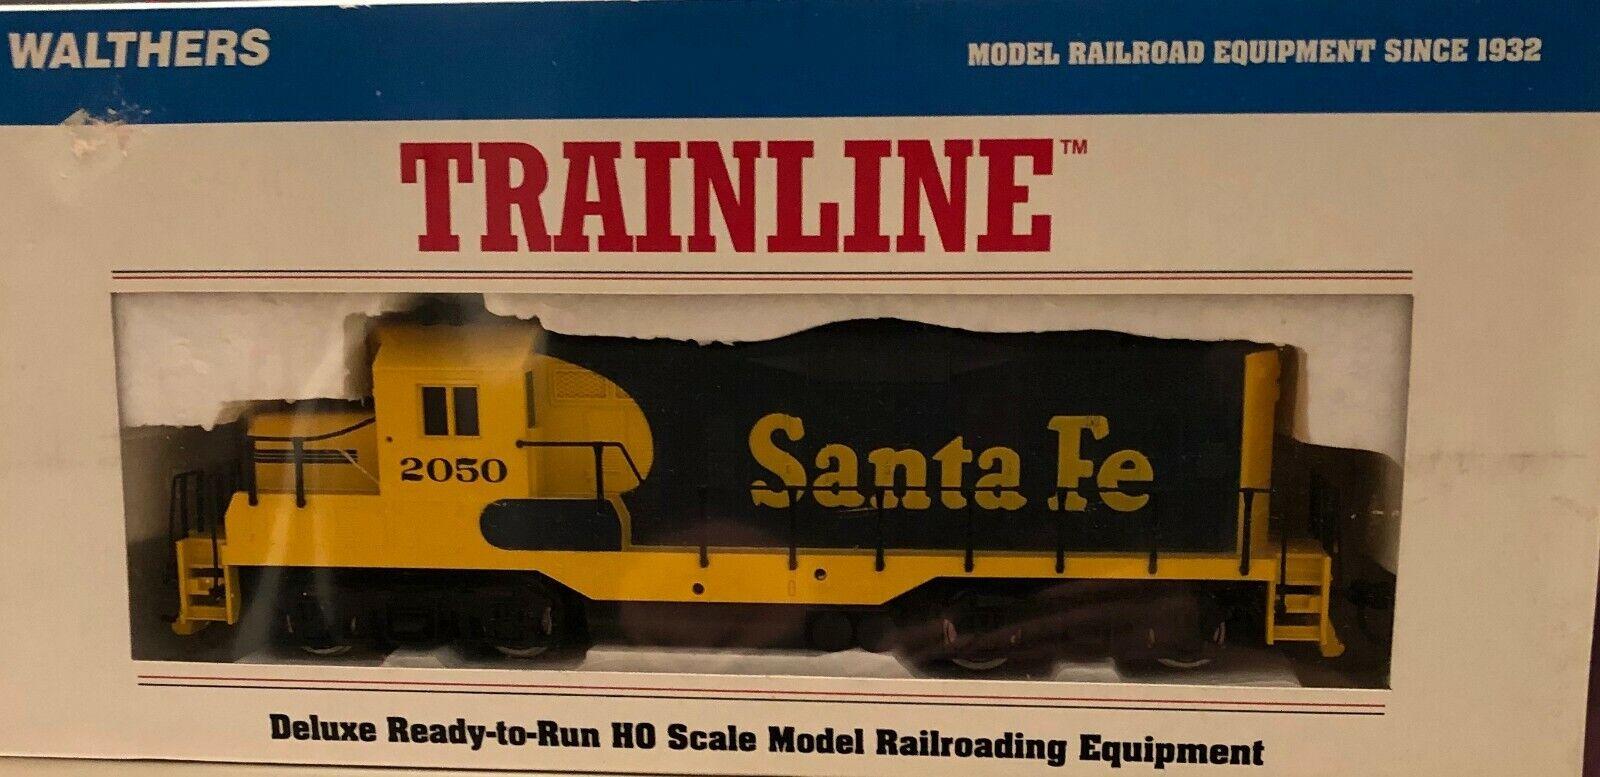 Walthers TRAINLINE HO Scale Santa Fe EMD GP9M Model Train - Brand New